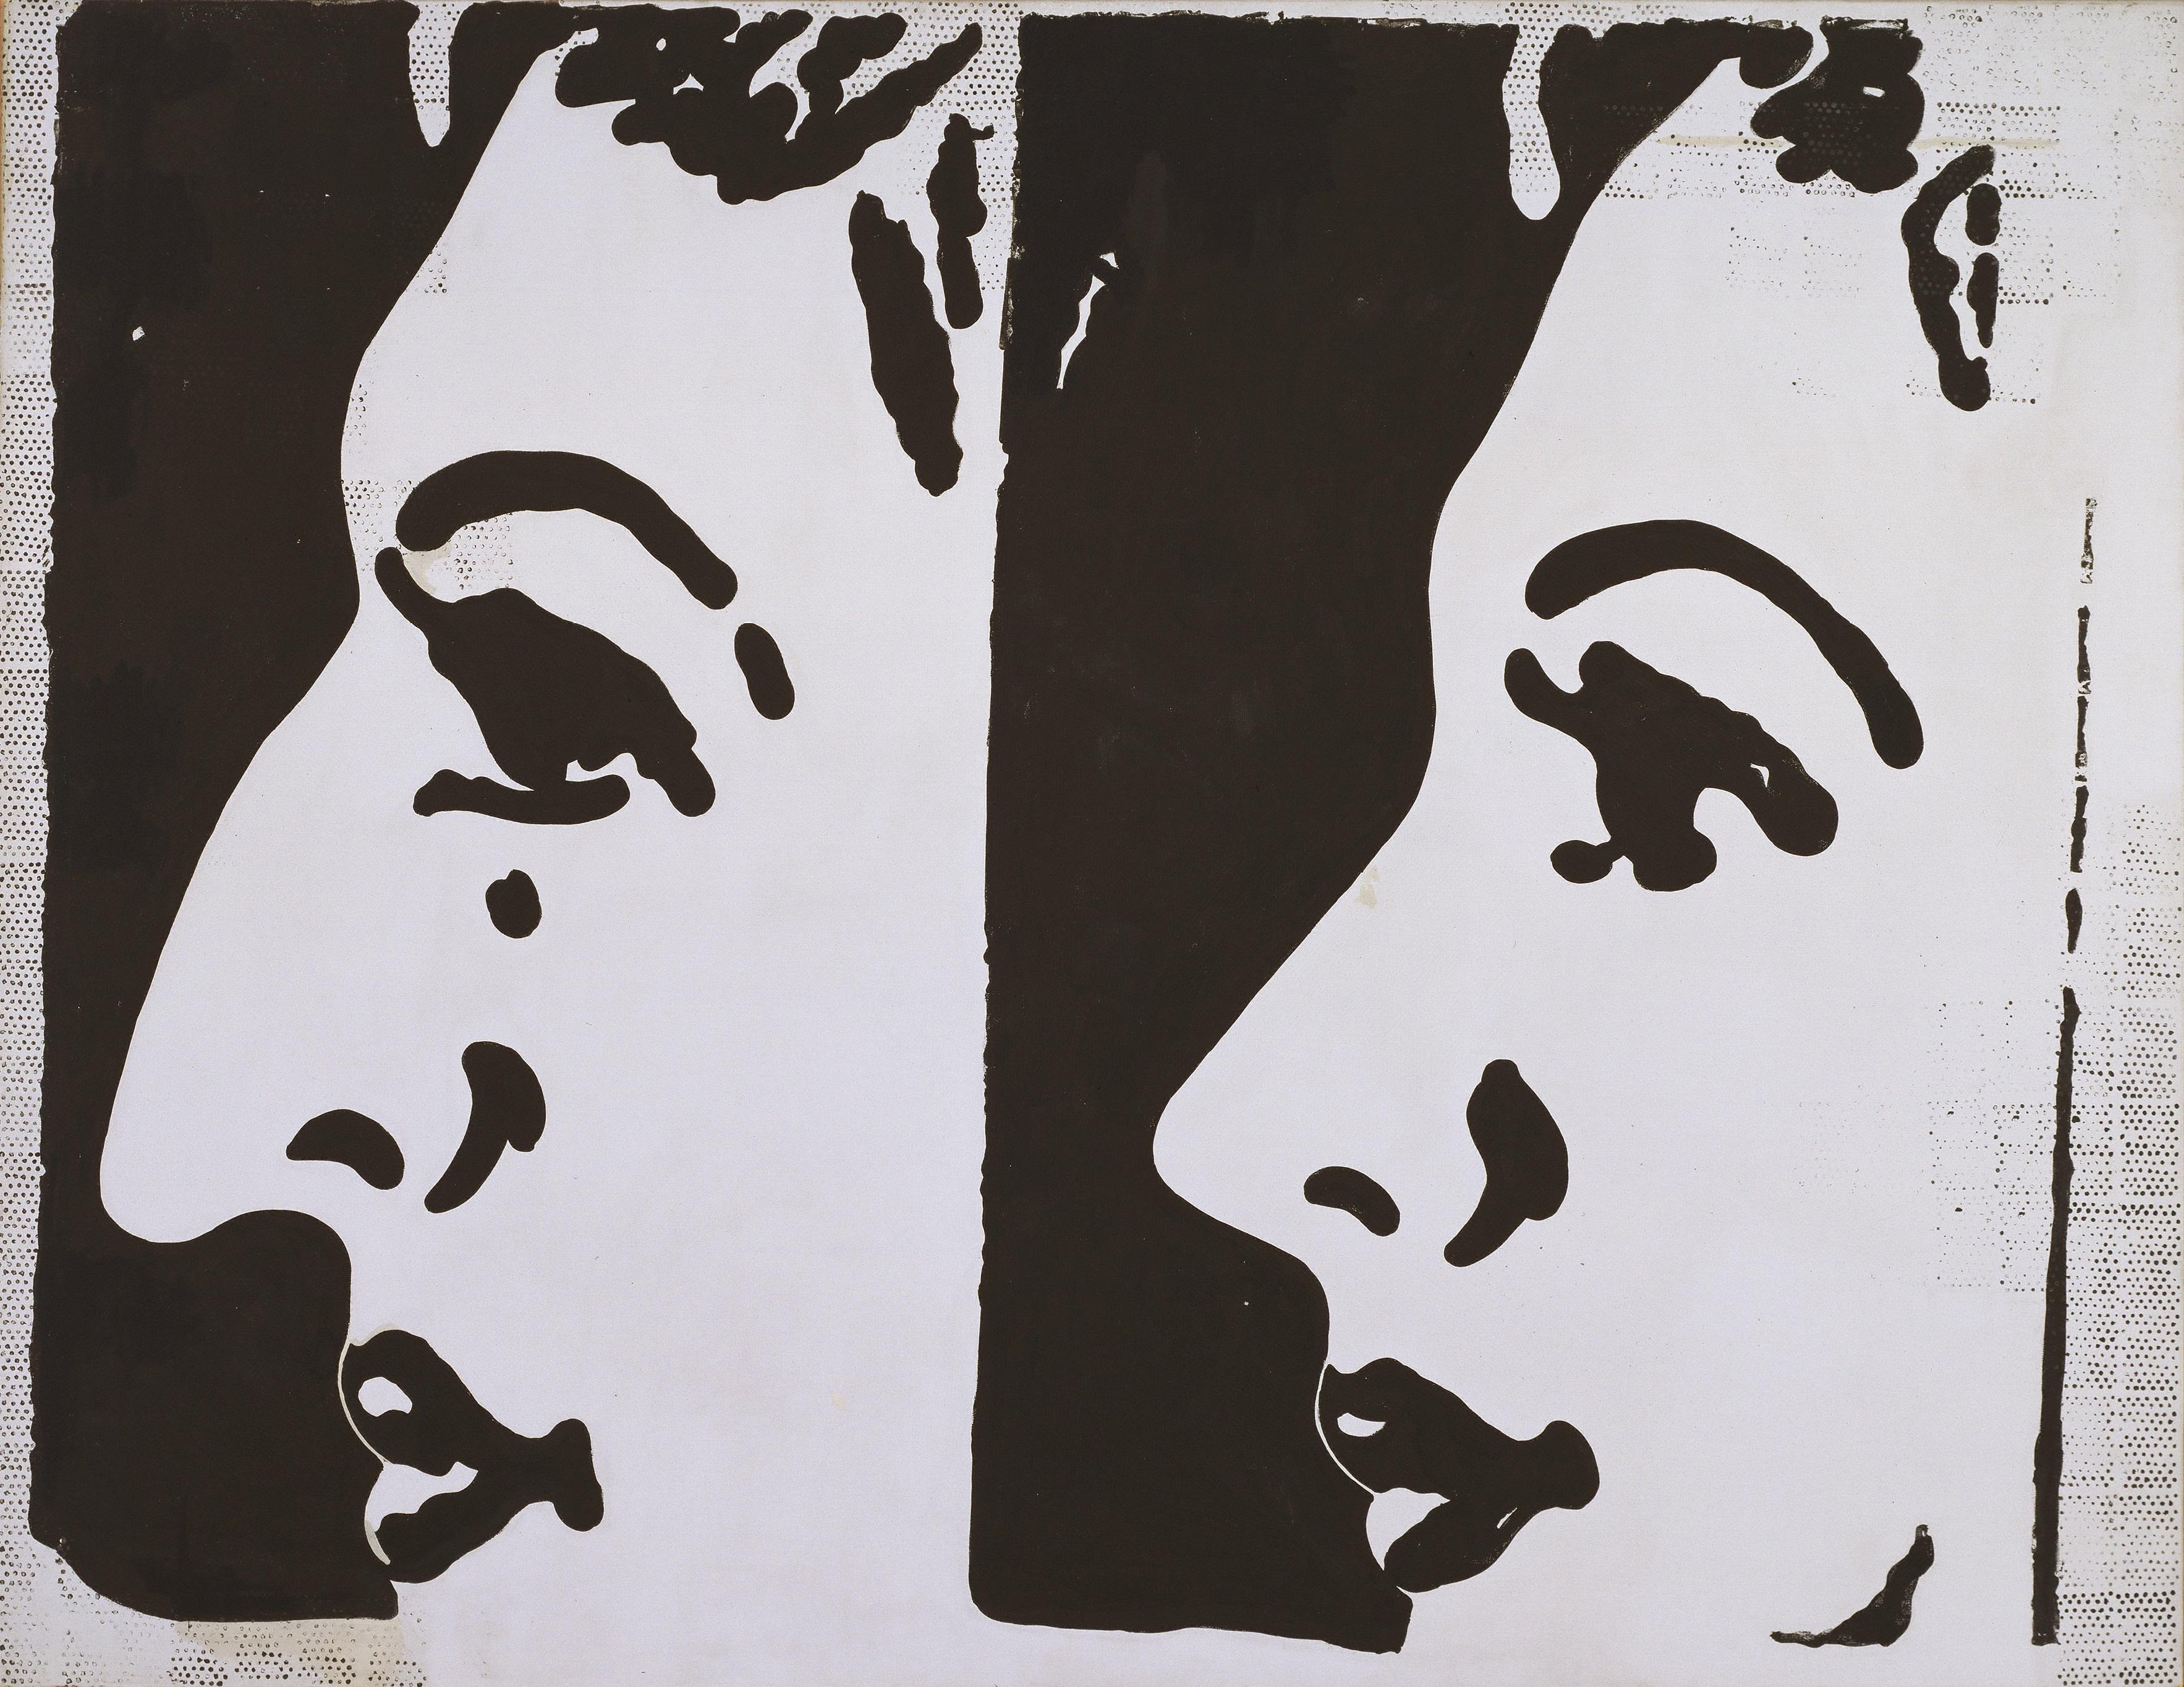 antes-y-despues-1961-caseina-y-lapiz-sobre-lino-the-museum-of-modern-art-nova-york-donat-per-david-geffen-1995-c-2017-t